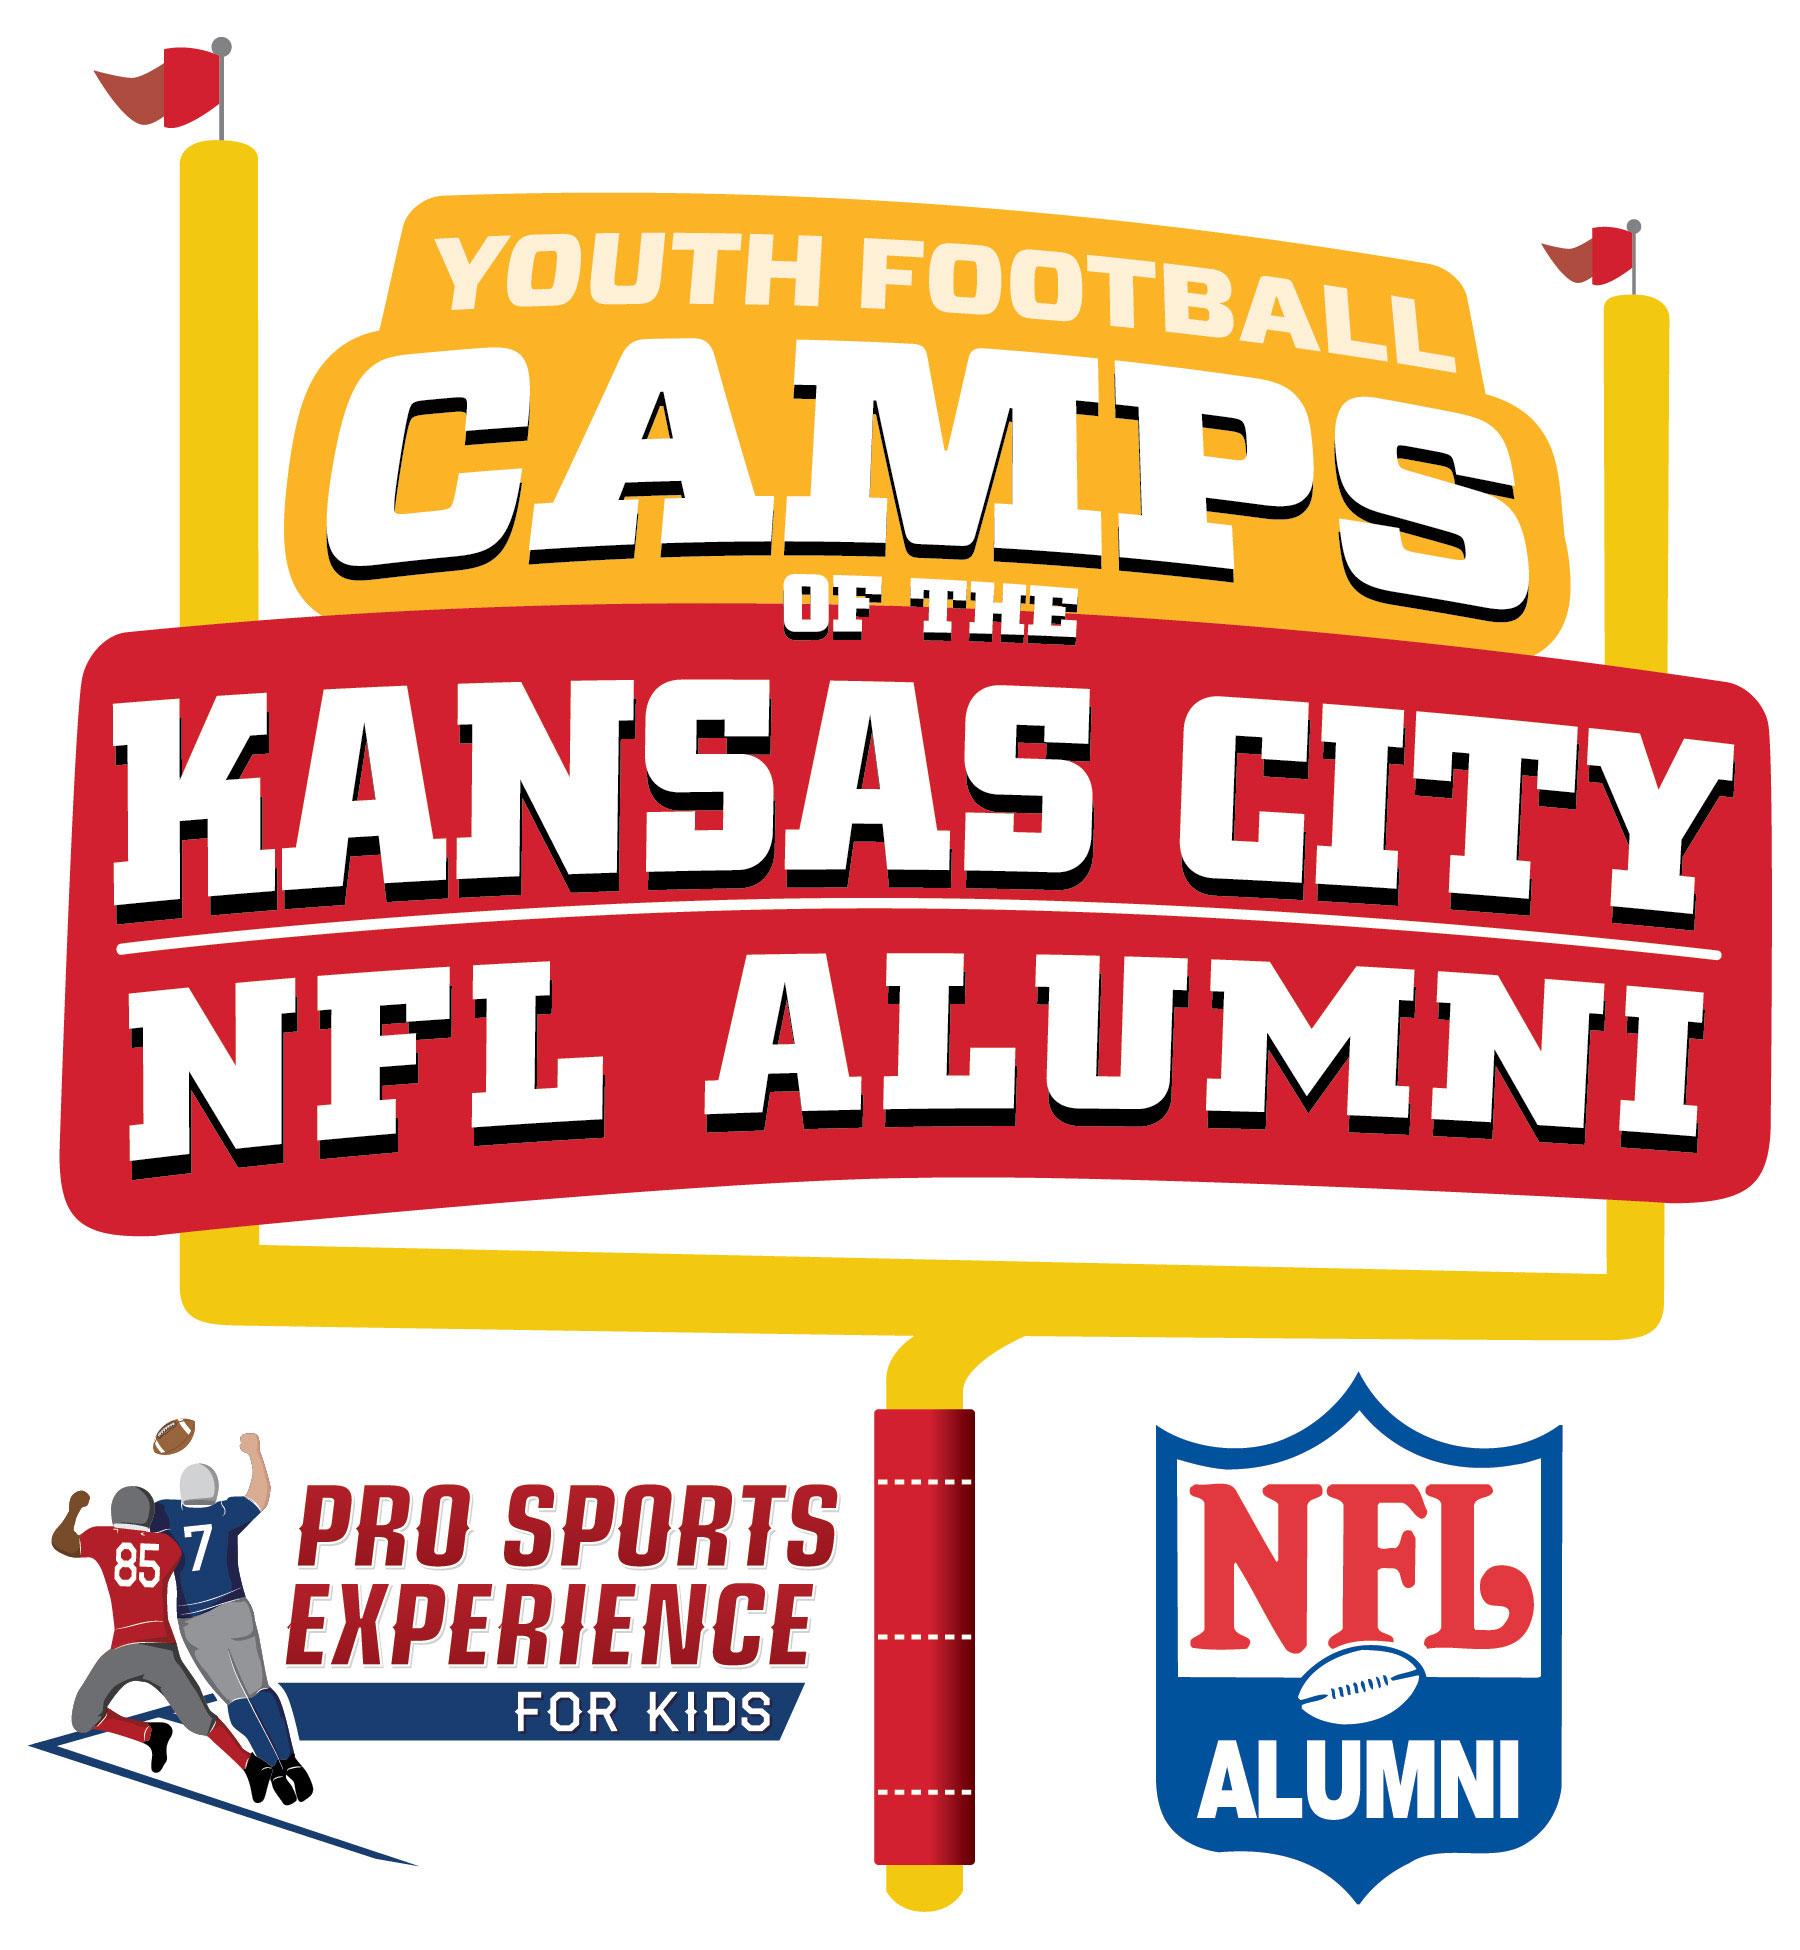 Kansas City NFL Alumni Hero Youth Football Camps - Independence